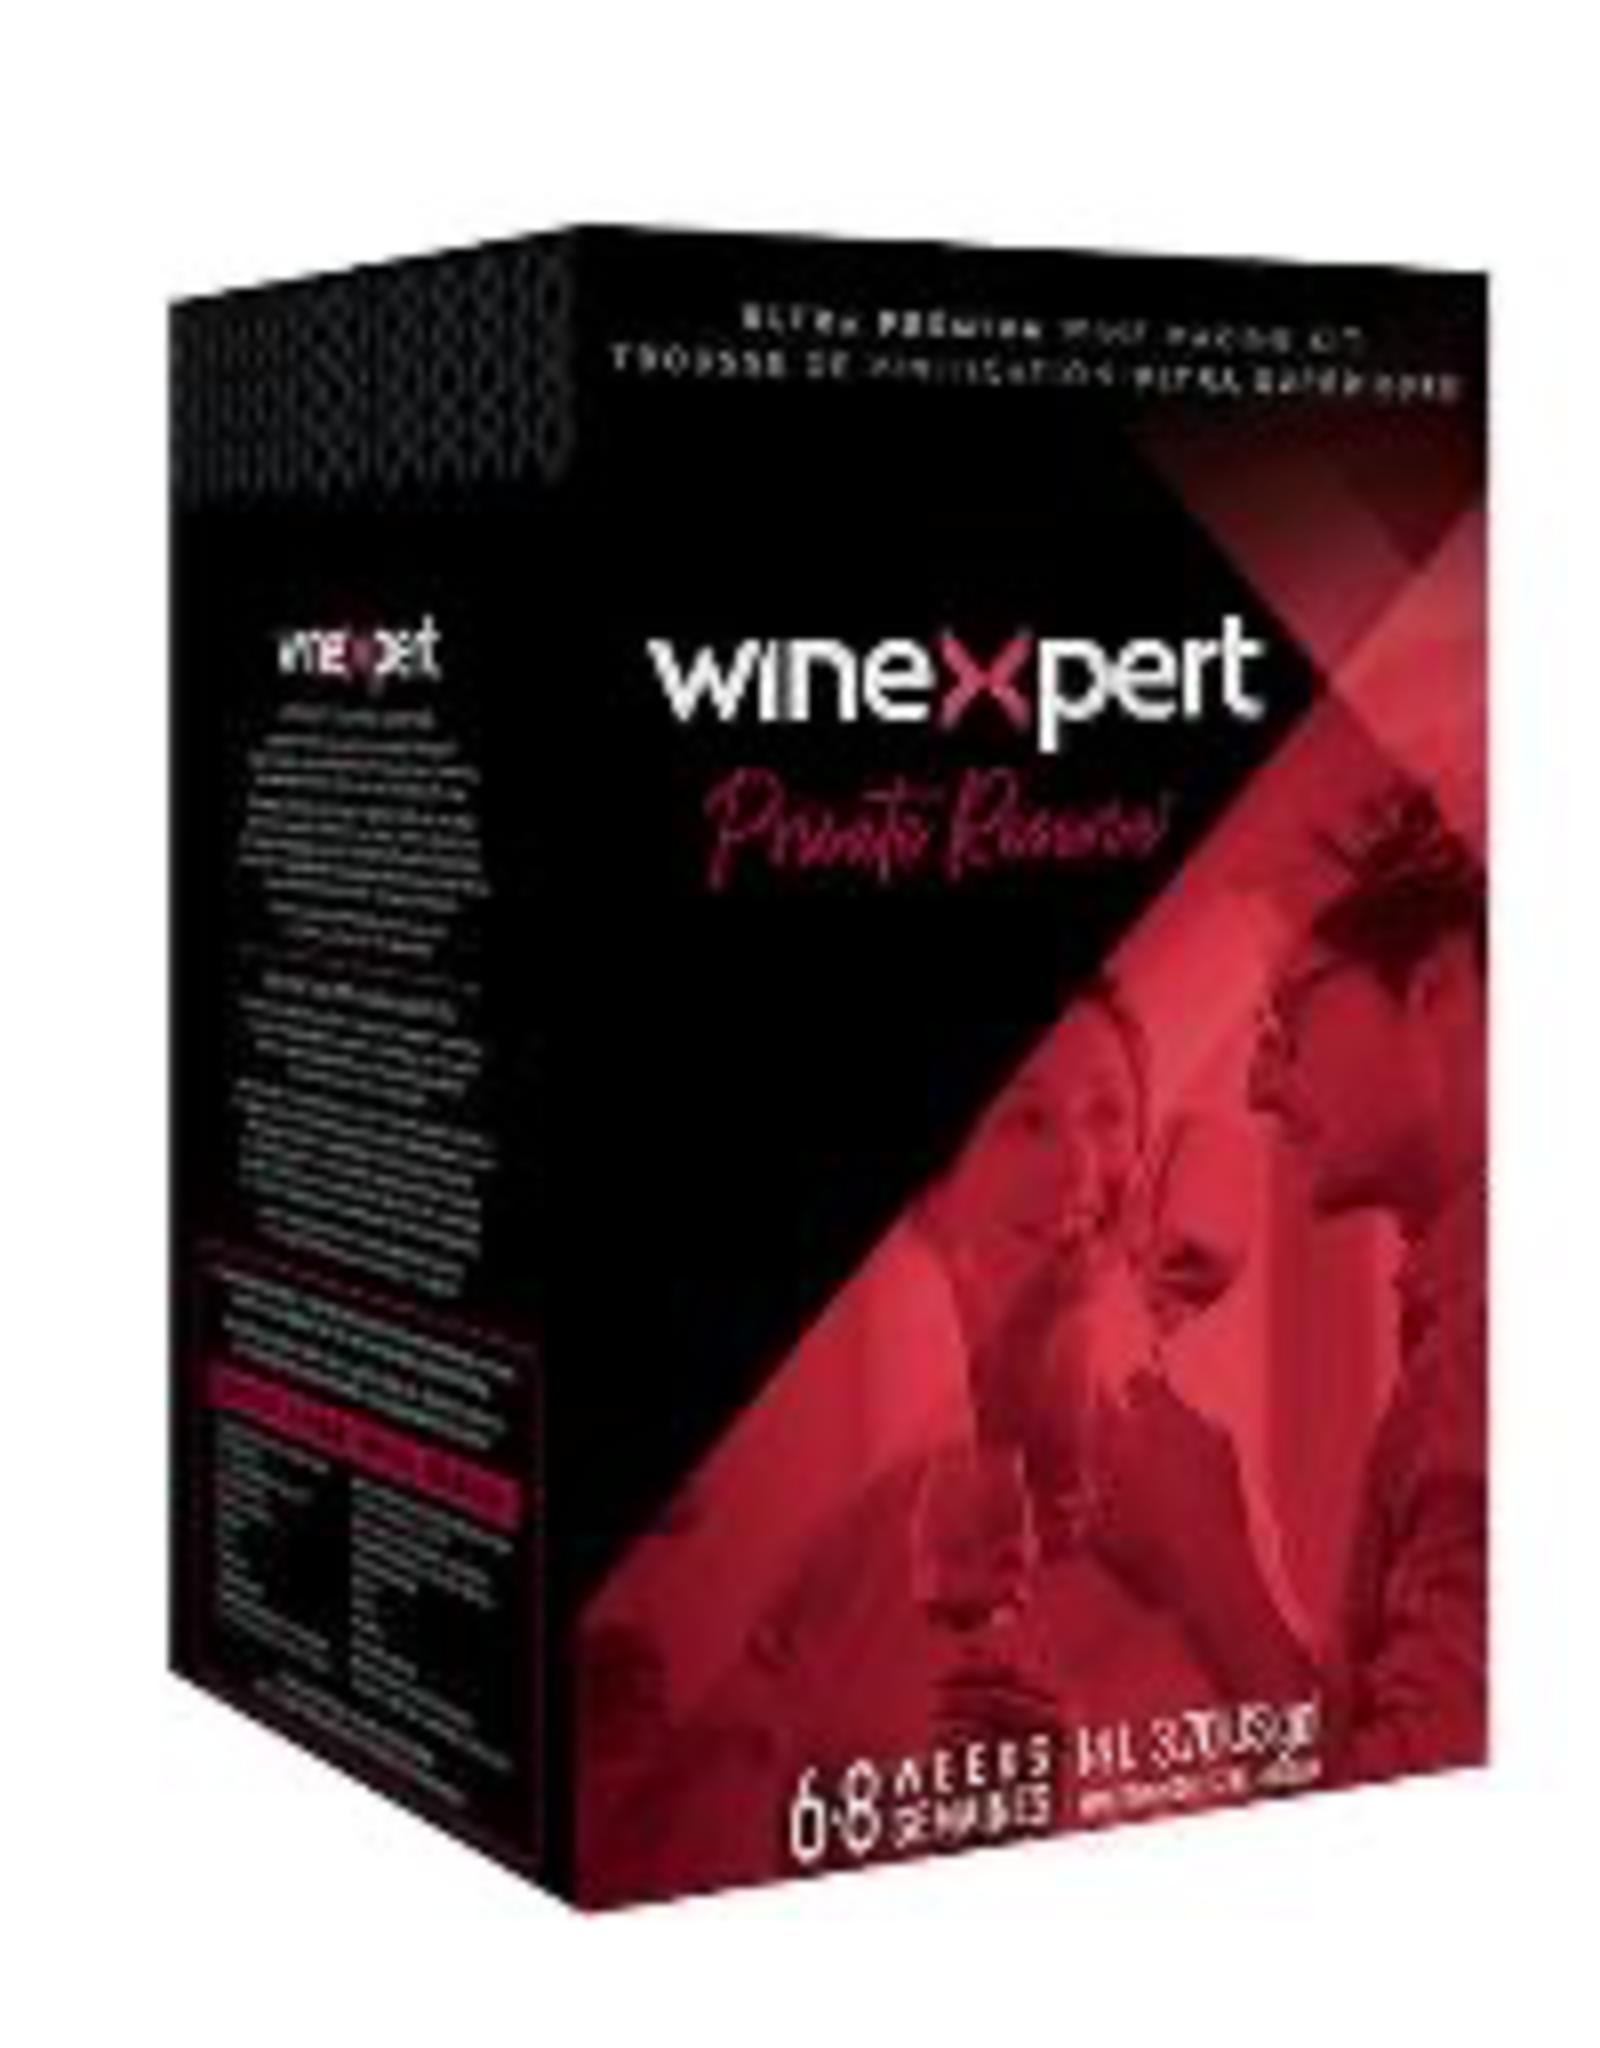 WINE EXPERT PRIVATE RESERVE NZ MARLBOROUGH SAUVIGNON BLANC 14L WINE KIT